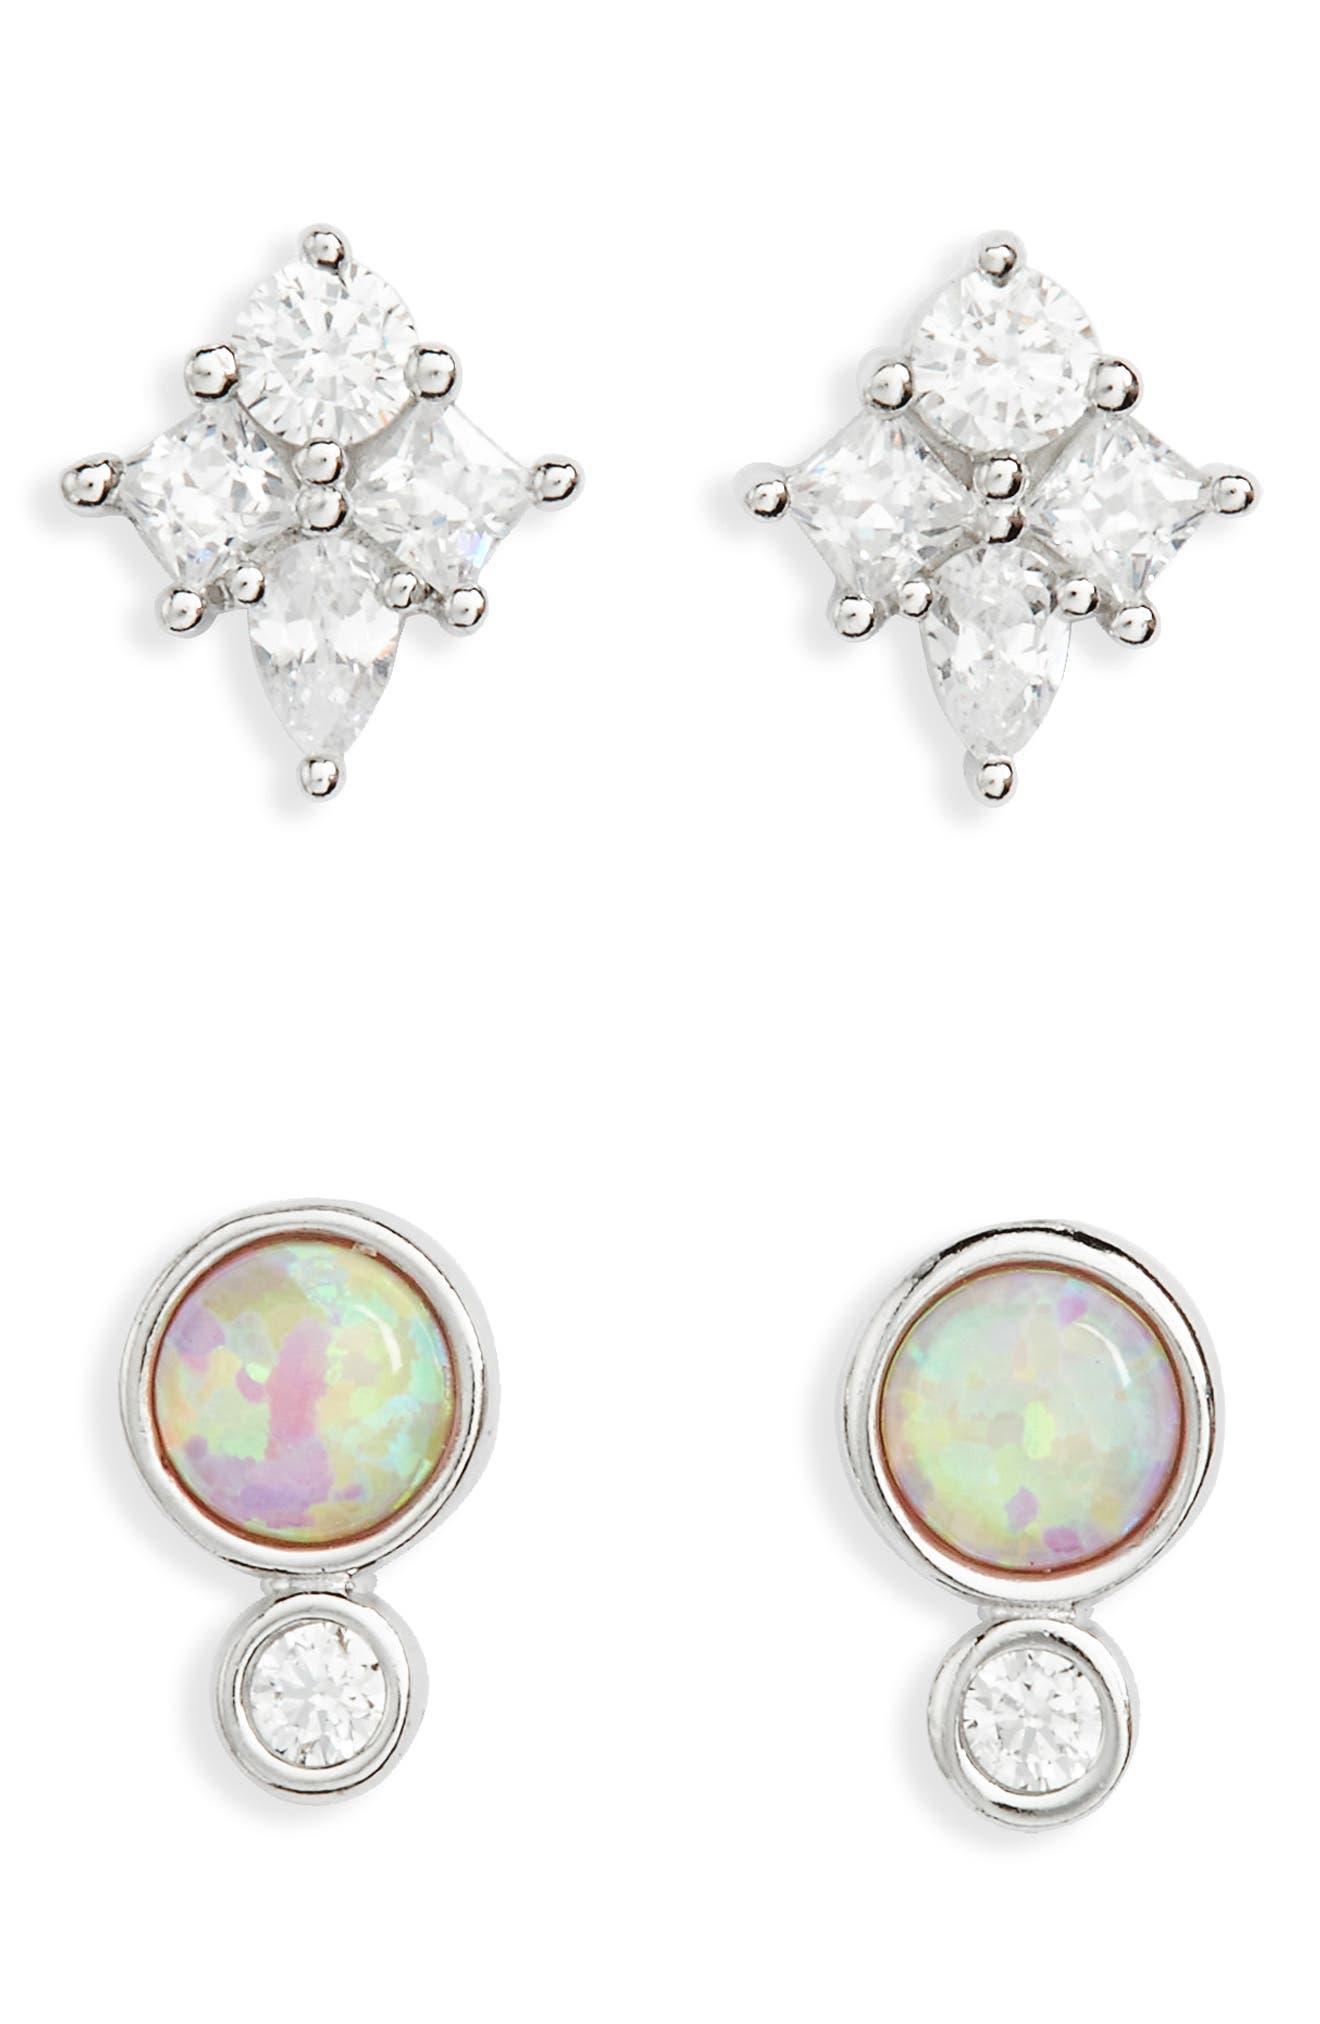 Set of 2 Opal & Cubic Zirconia Stud Earrings,                         Main,                         color, 040